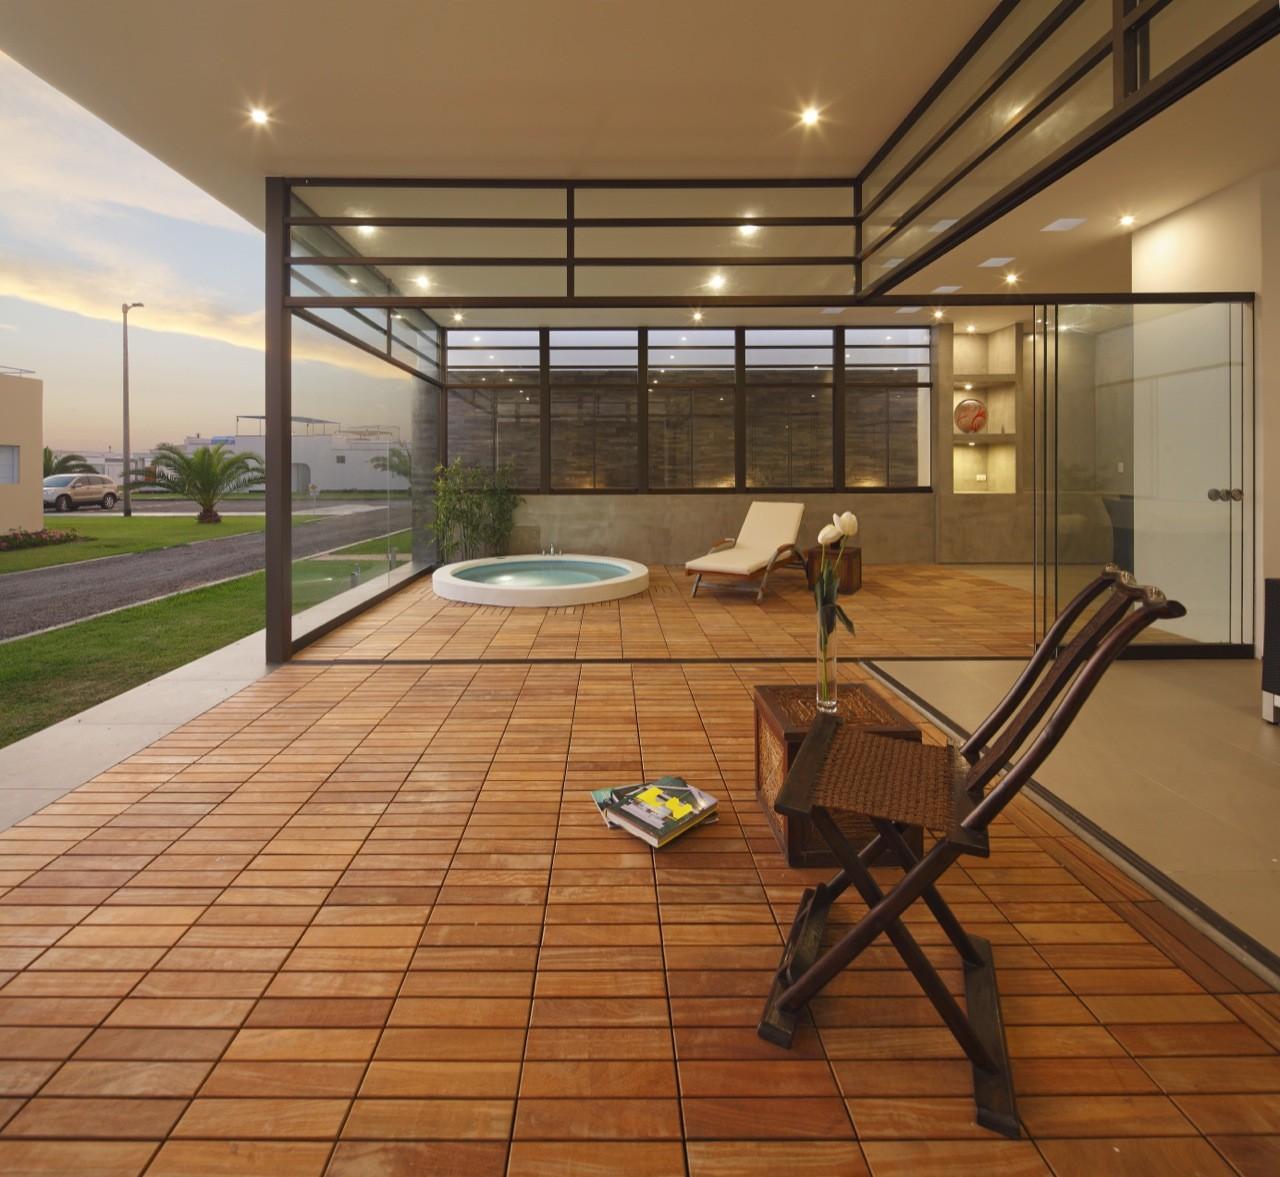 Casa Zen  Estudio Gmez de la Torre  Guerrero Arquitectos  ArchDaily Brasil